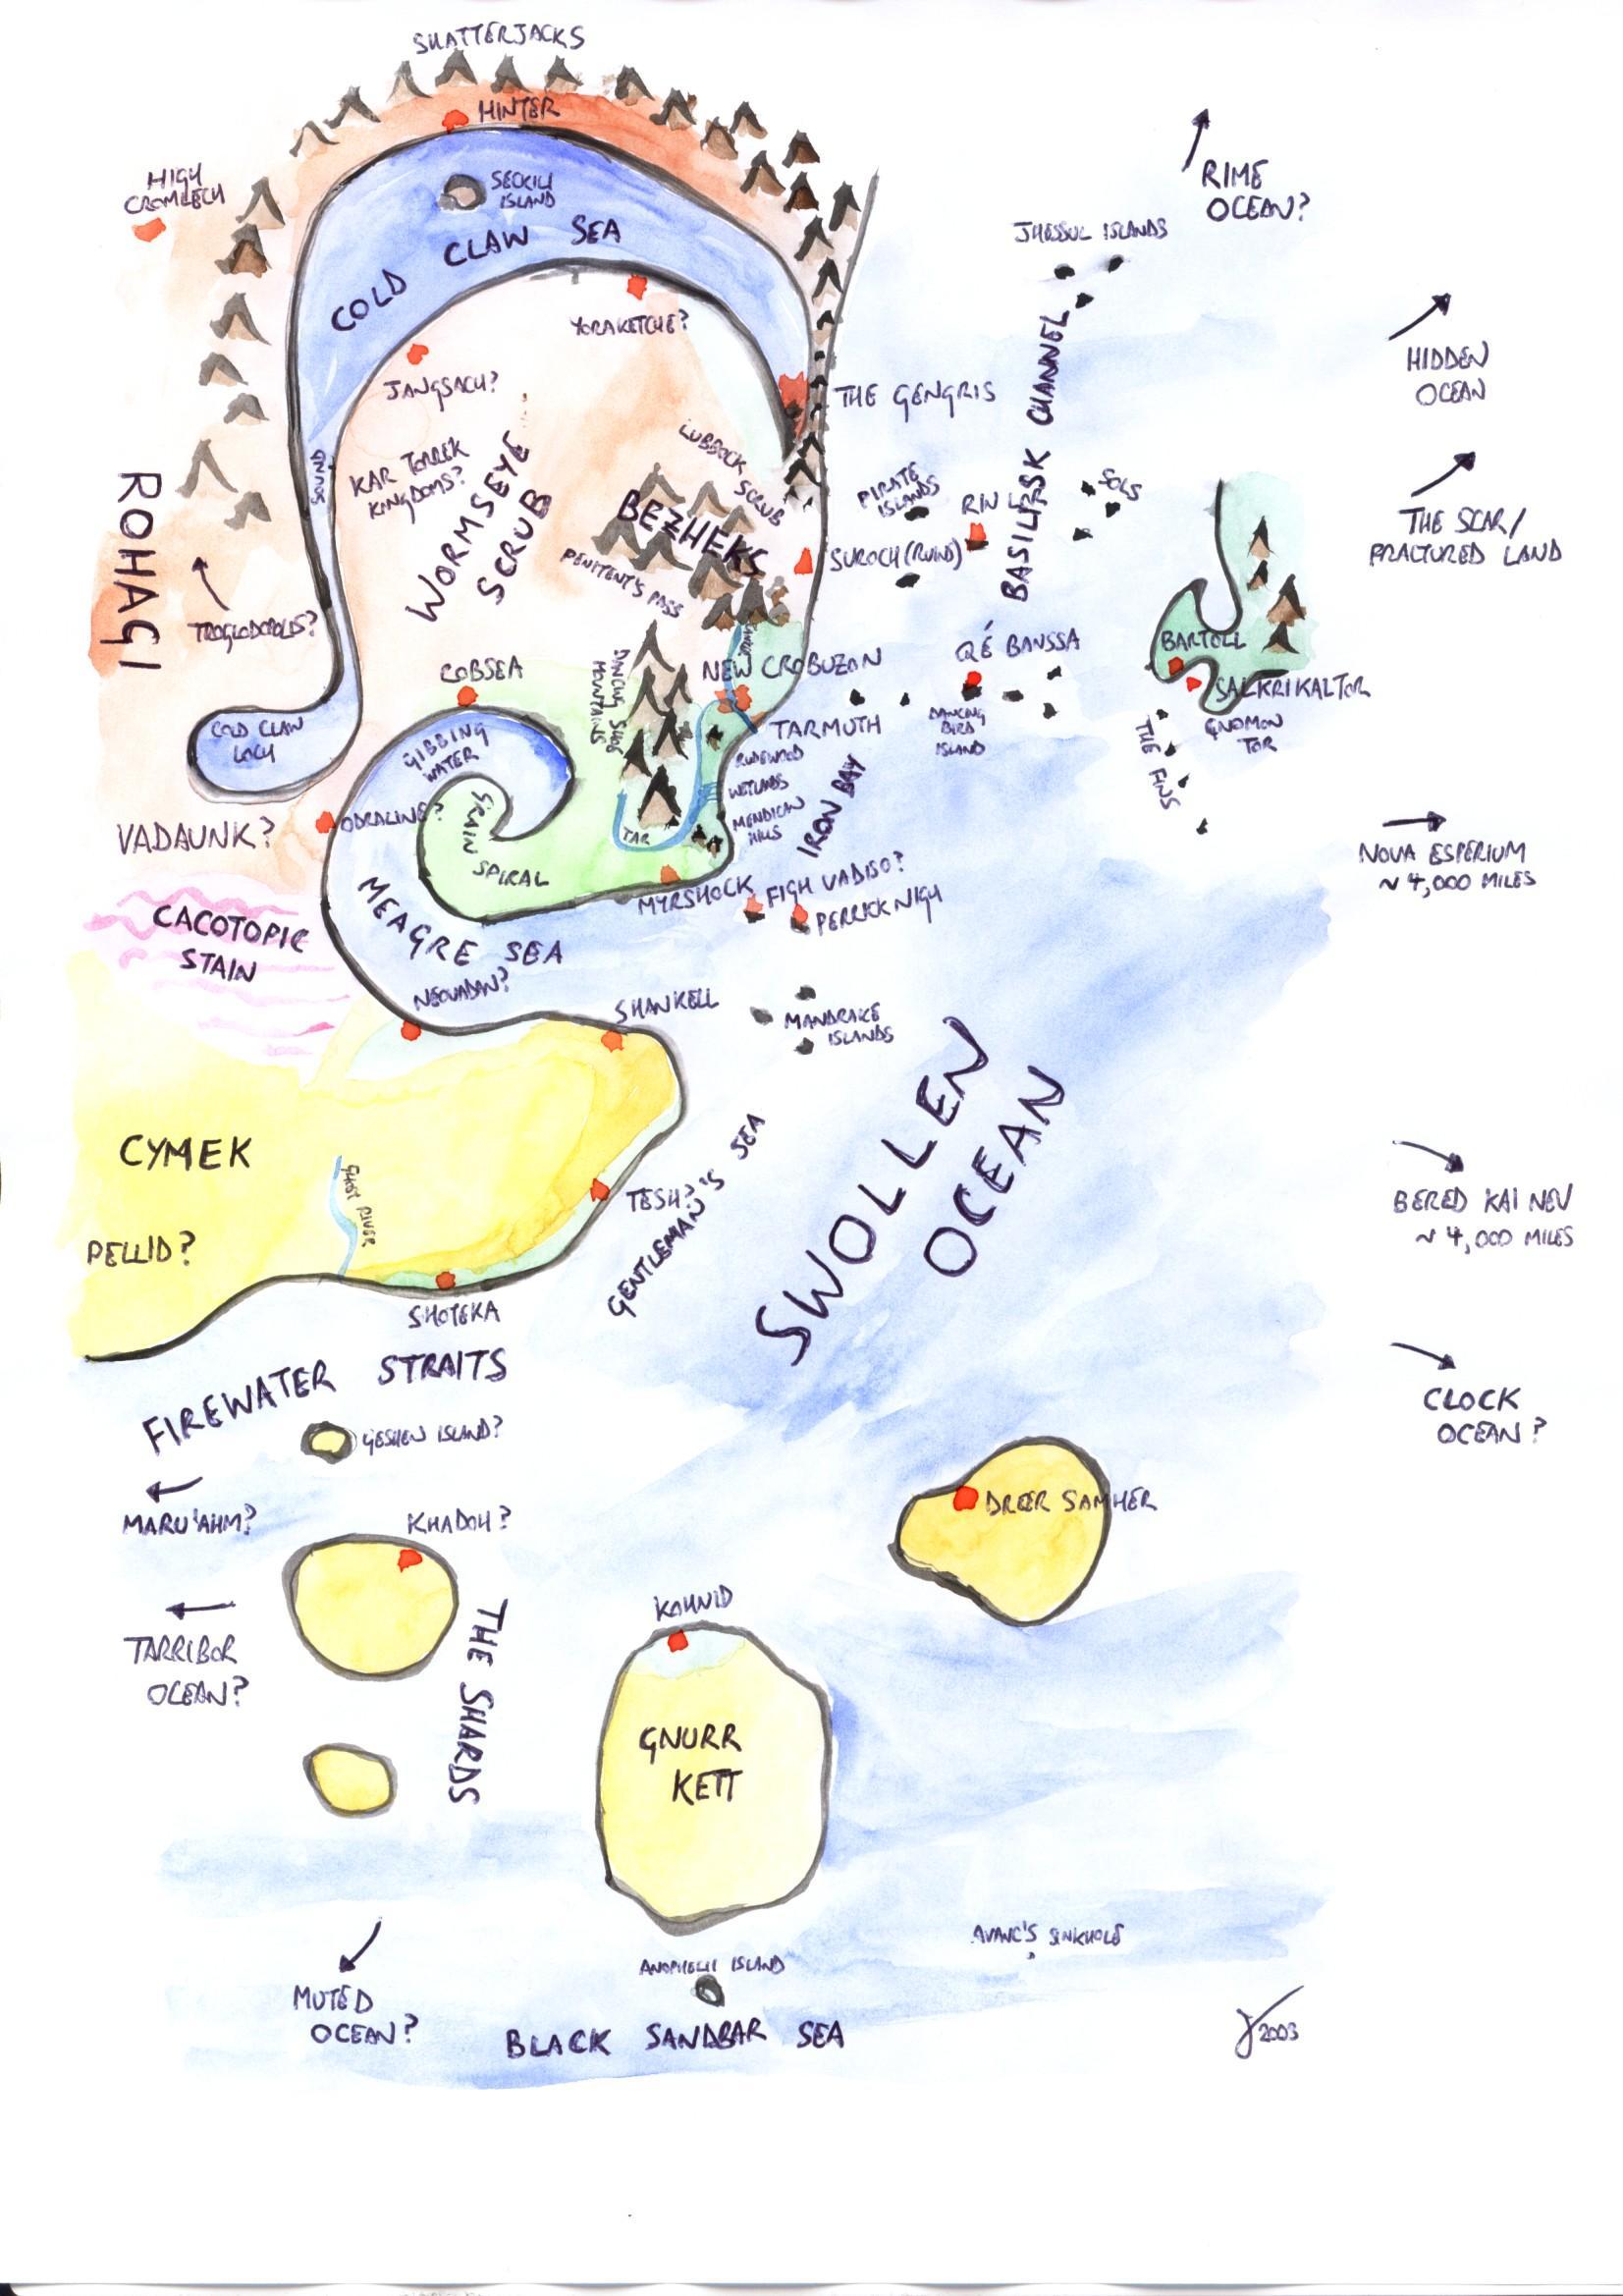 Bas Lag Map Mieville New Crozubon